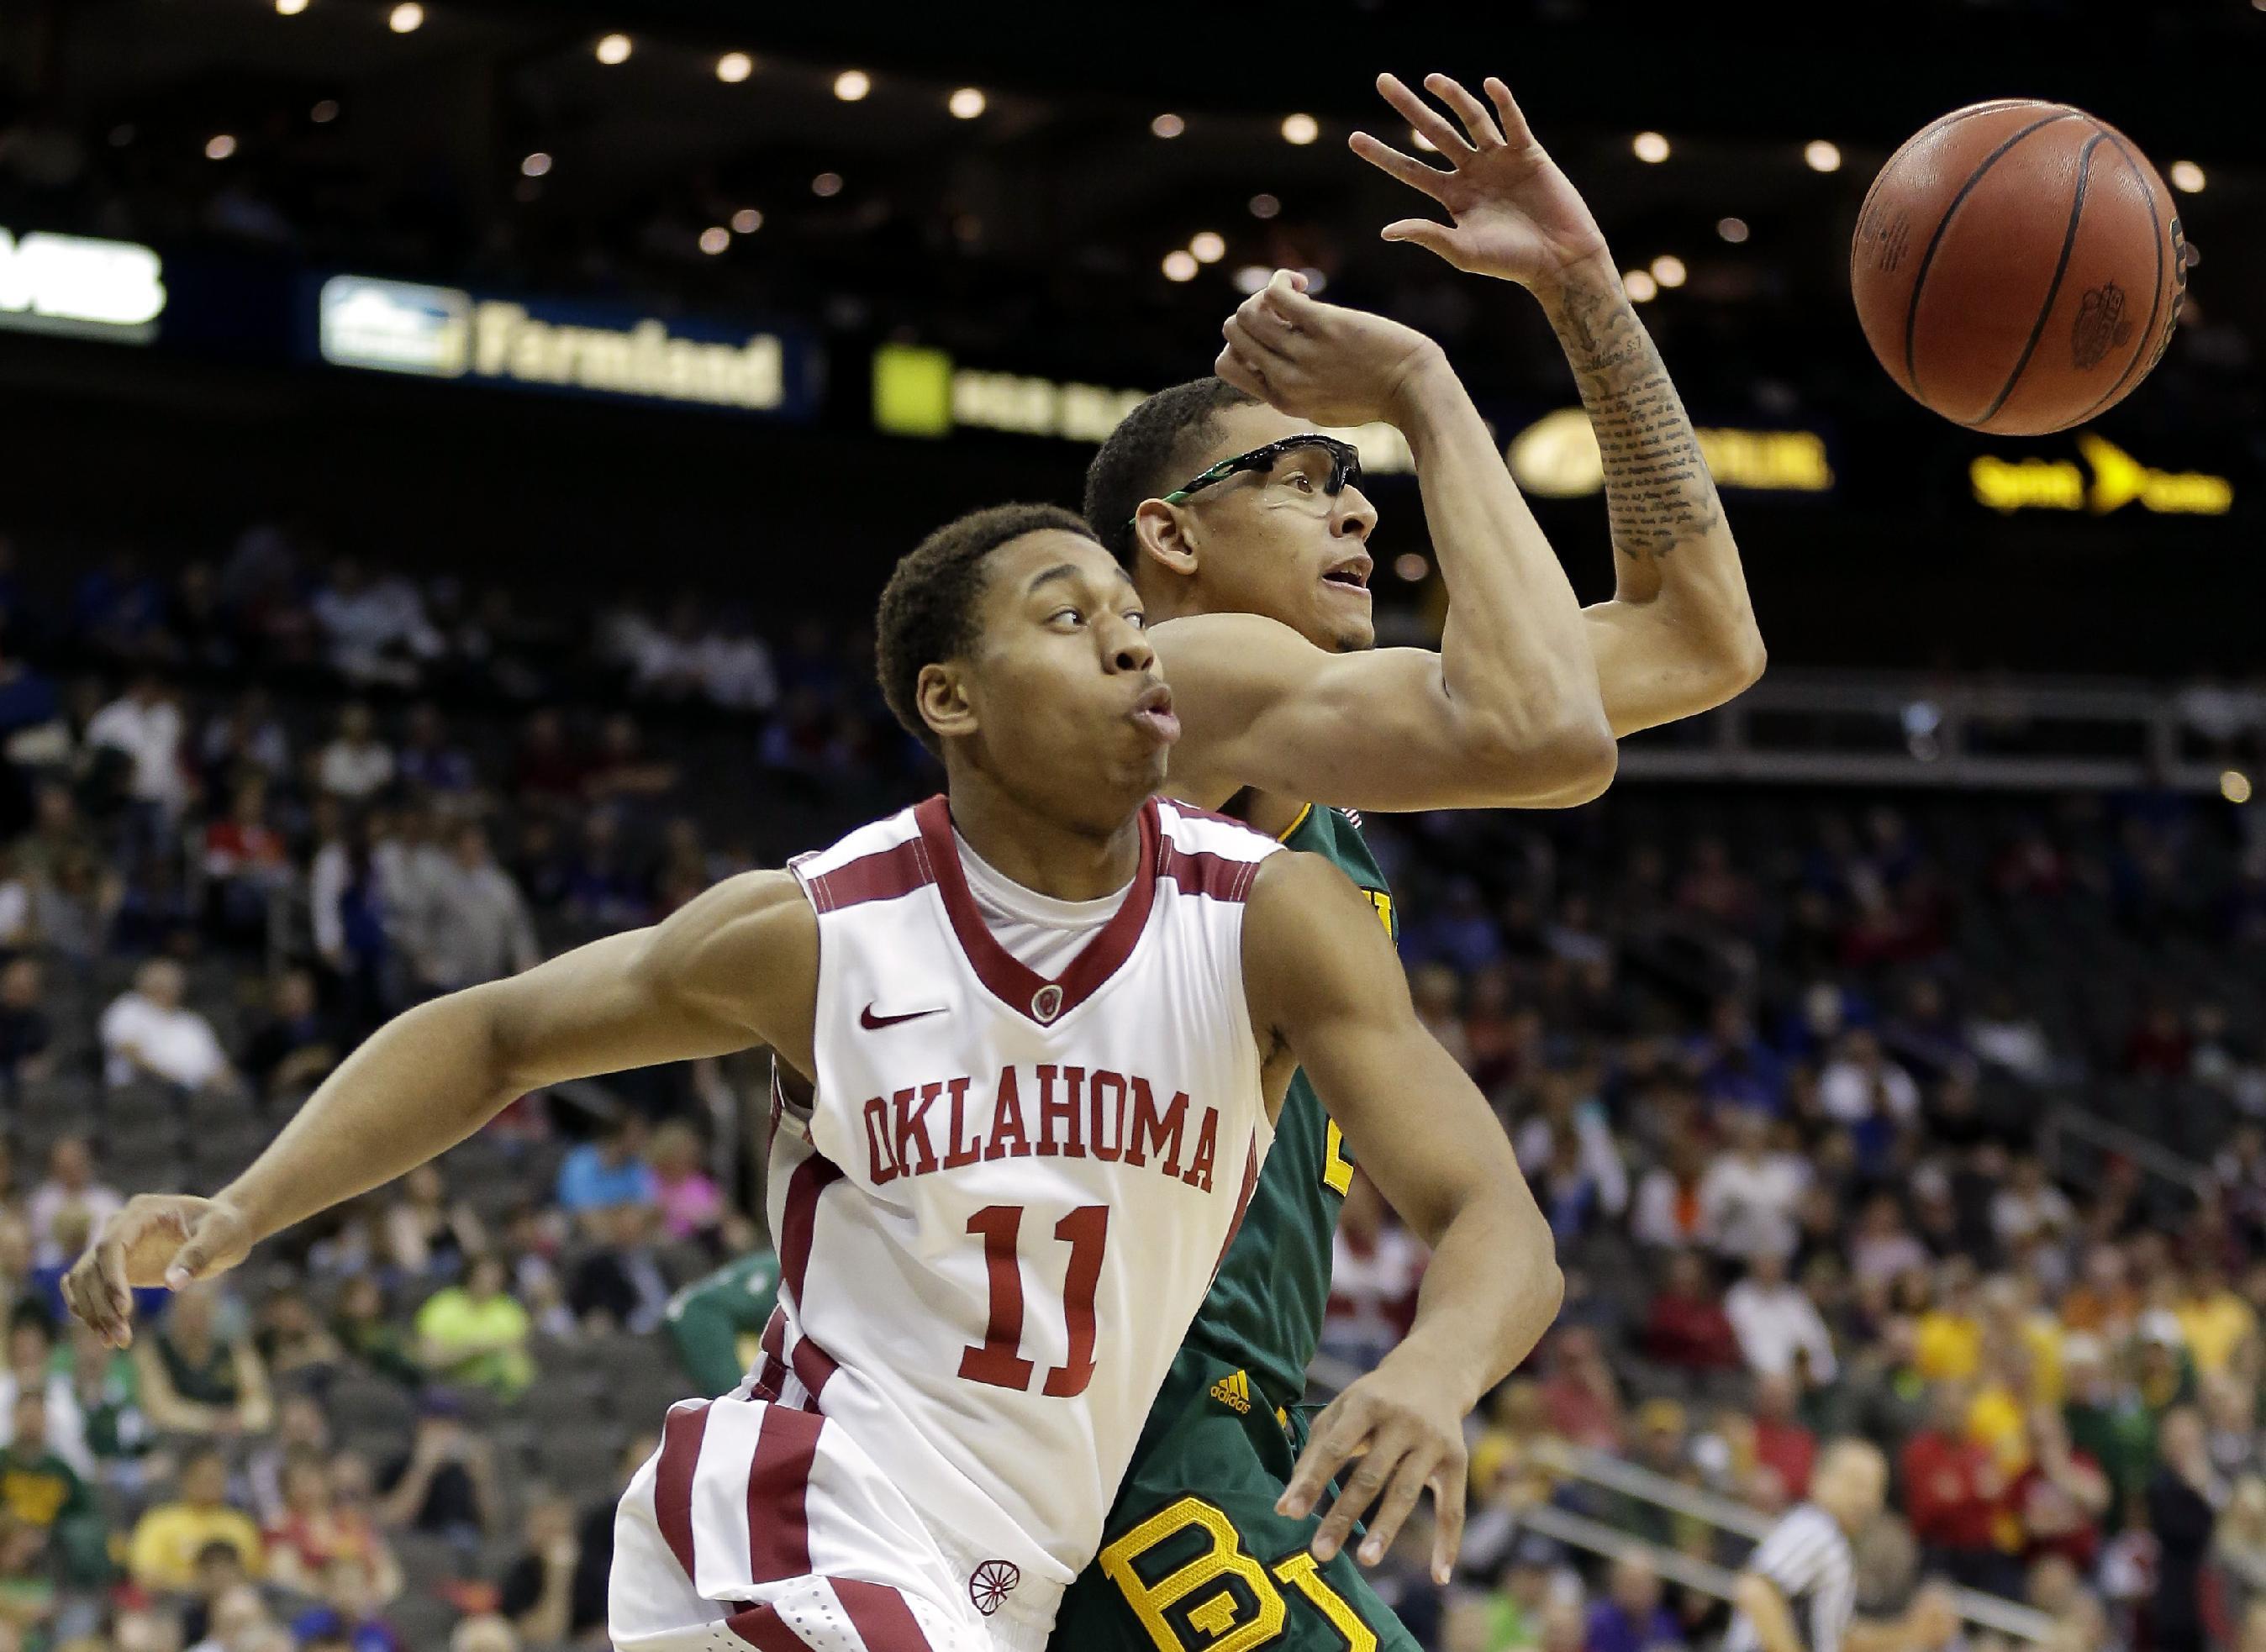 Baylor holds on to down No. 17 Oklahoma, 78-73